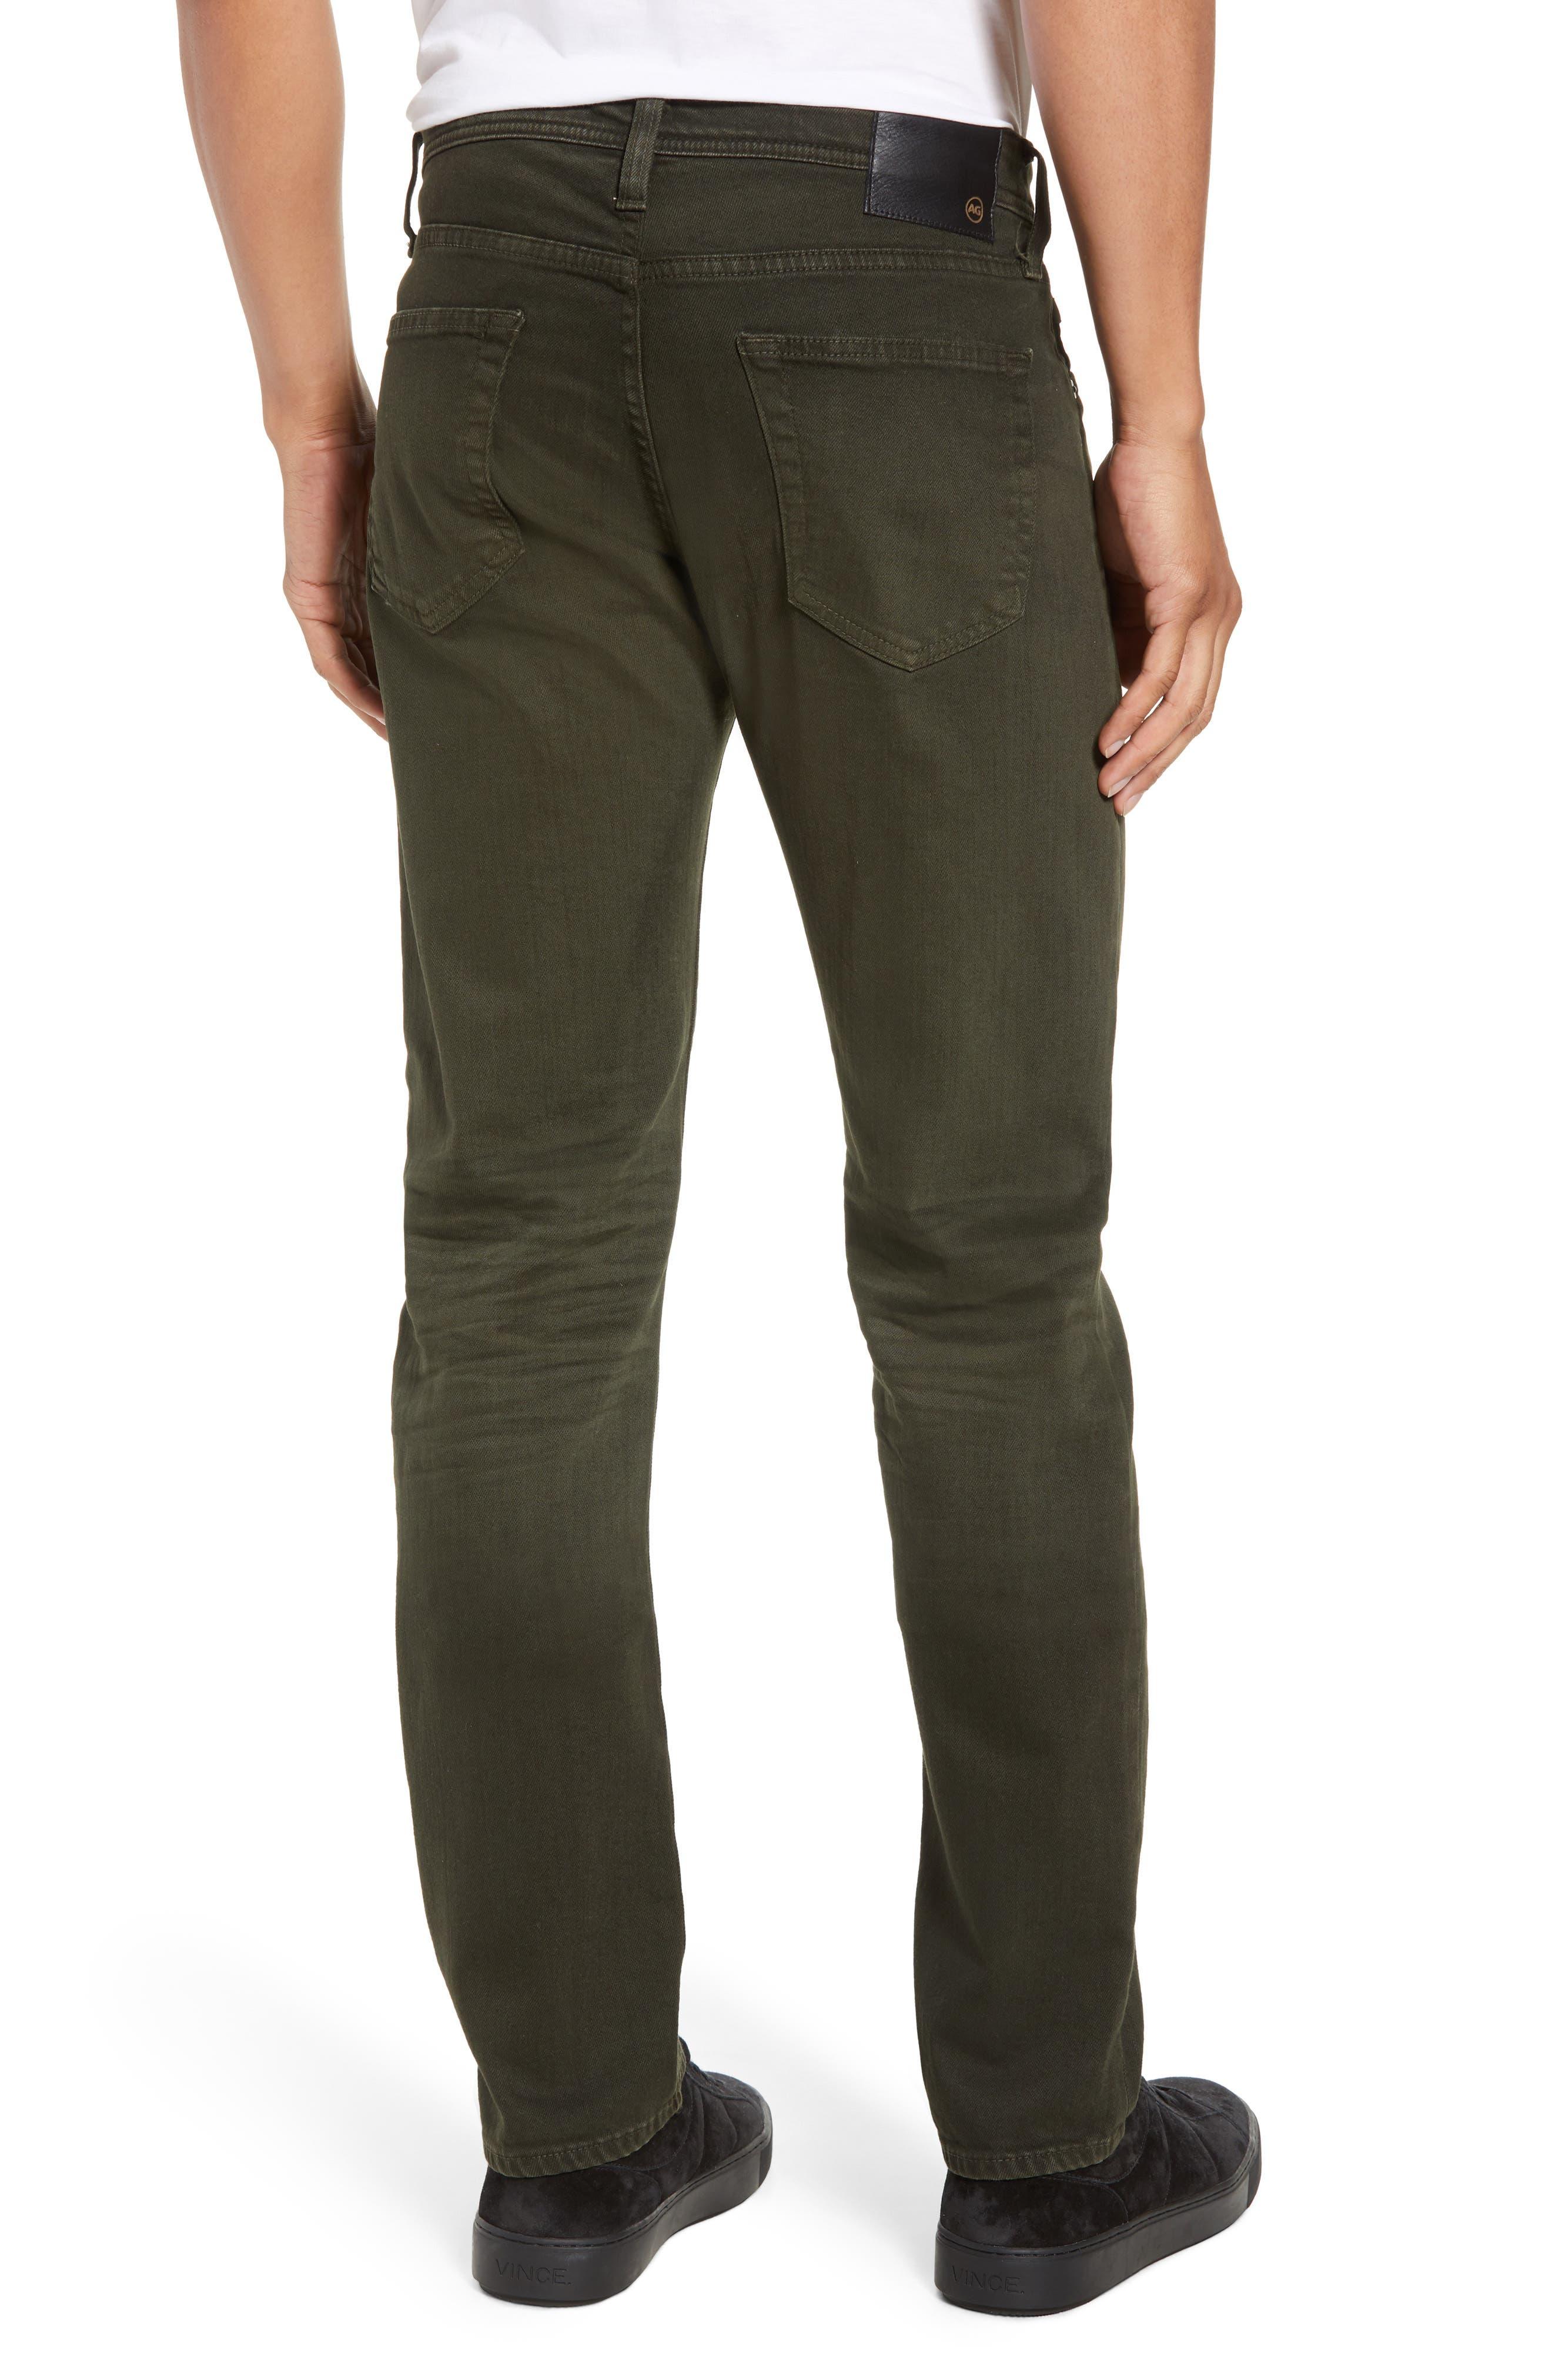 Tellis Slim Fit Jeans,                             Alternate thumbnail 2, color,                             7 YEARS OAK GROVE